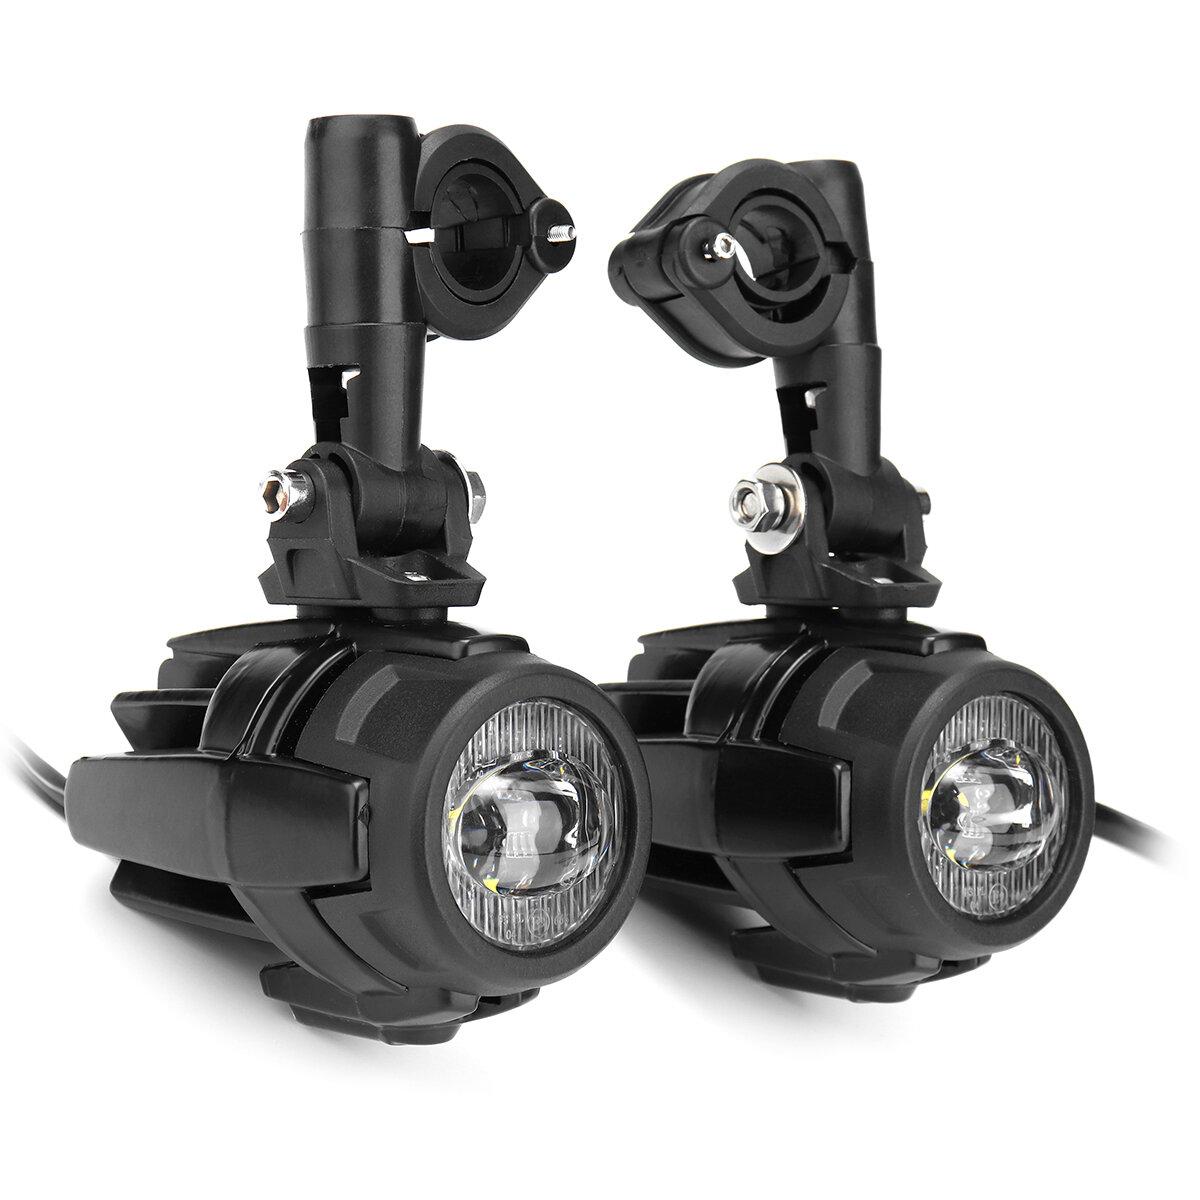 Universal Motorcycle Angel Eye LED Headlight Running Light Hi / Lo Beam - 7